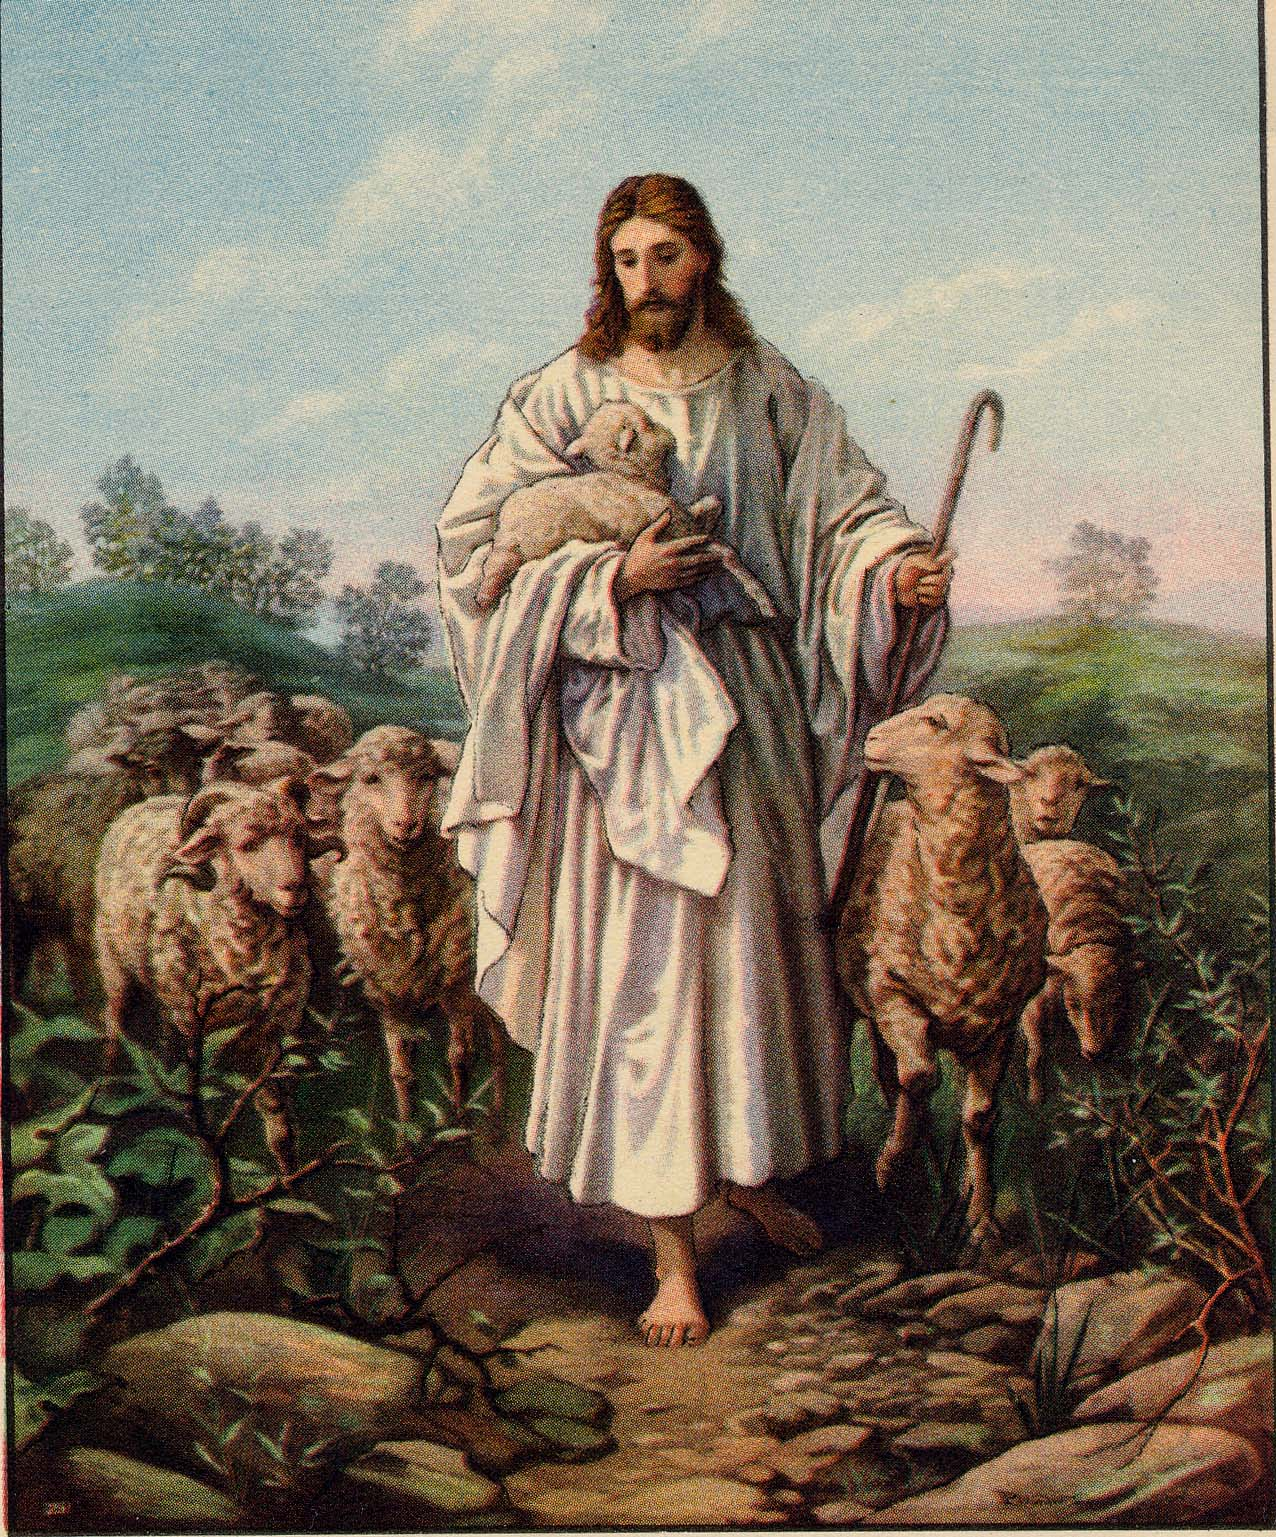 Sjungande Aposteln: Vår Herde | {Herde 12}